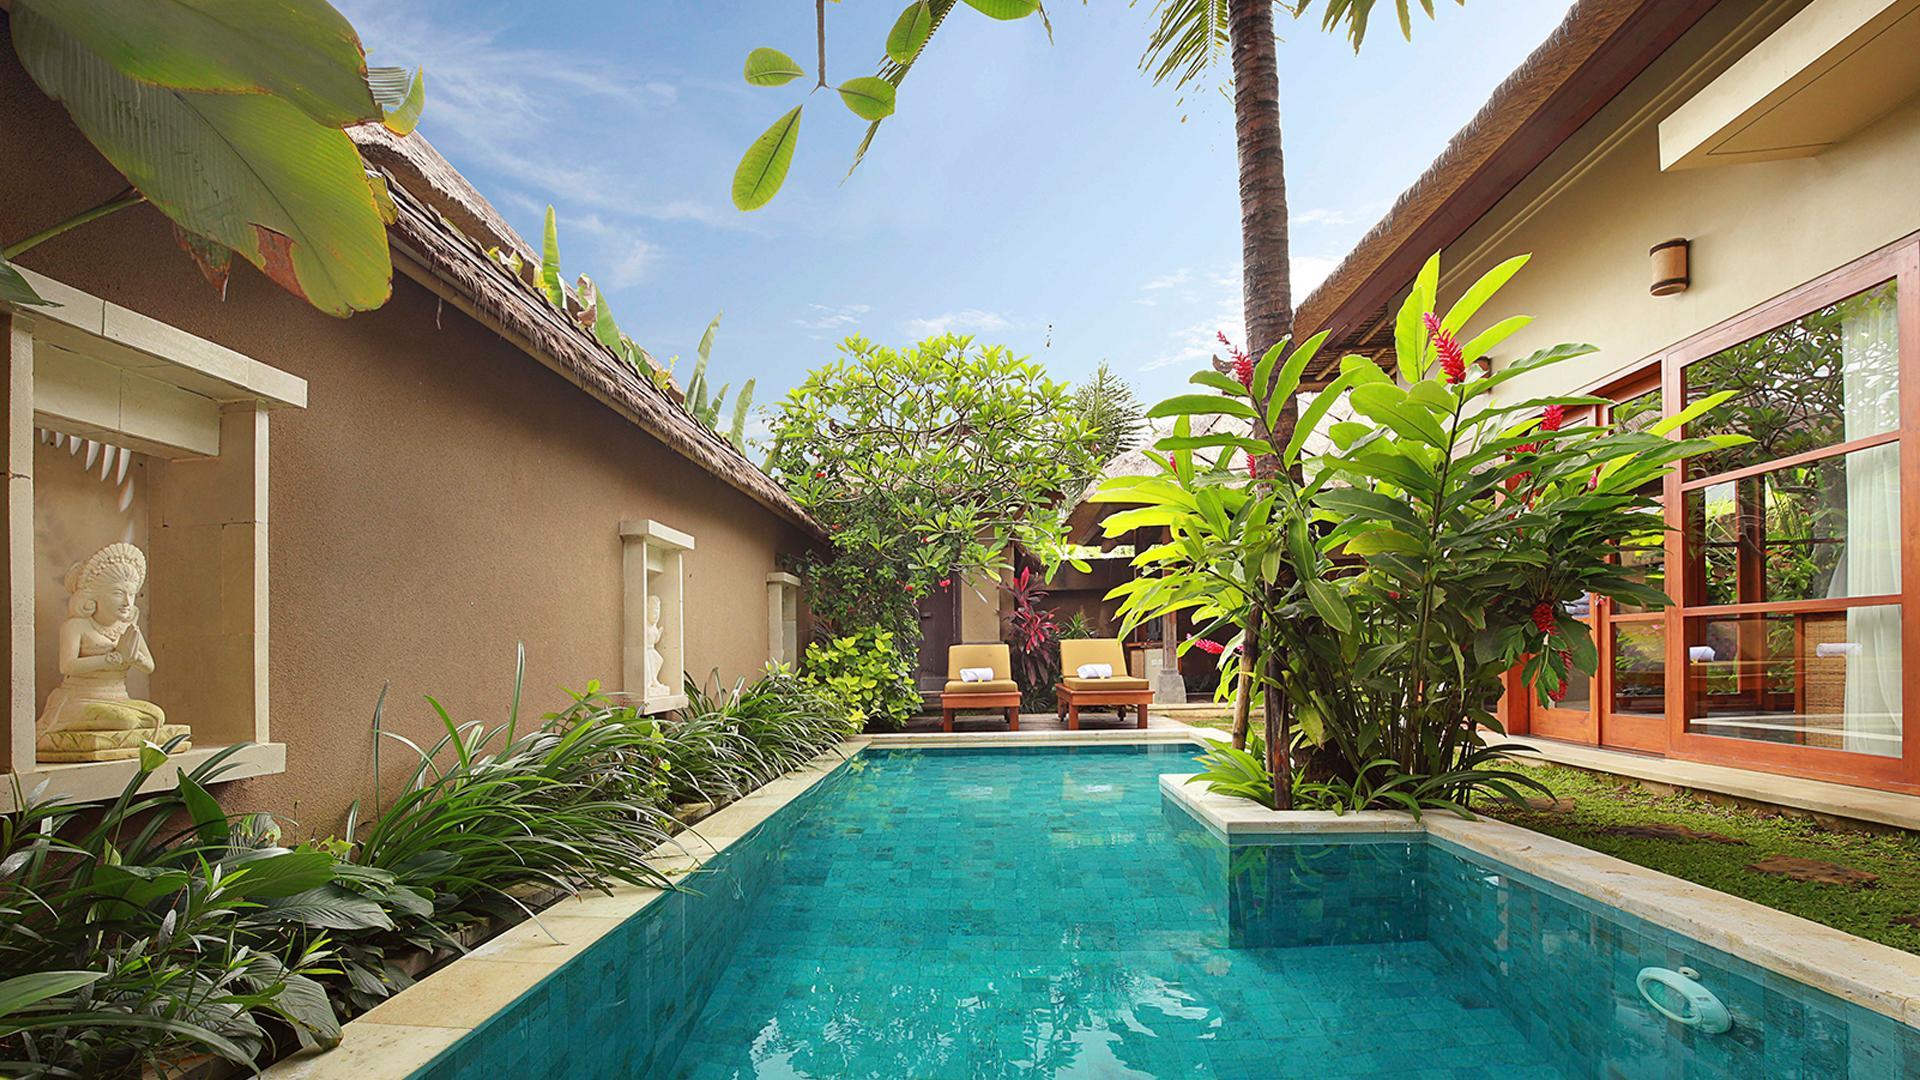 One-Bedroom Deluxe Pool Villa image 1 at Ubud Nyuh Bali Resort & Spa by Kabupaten Gianyar, Bali, Indonesia